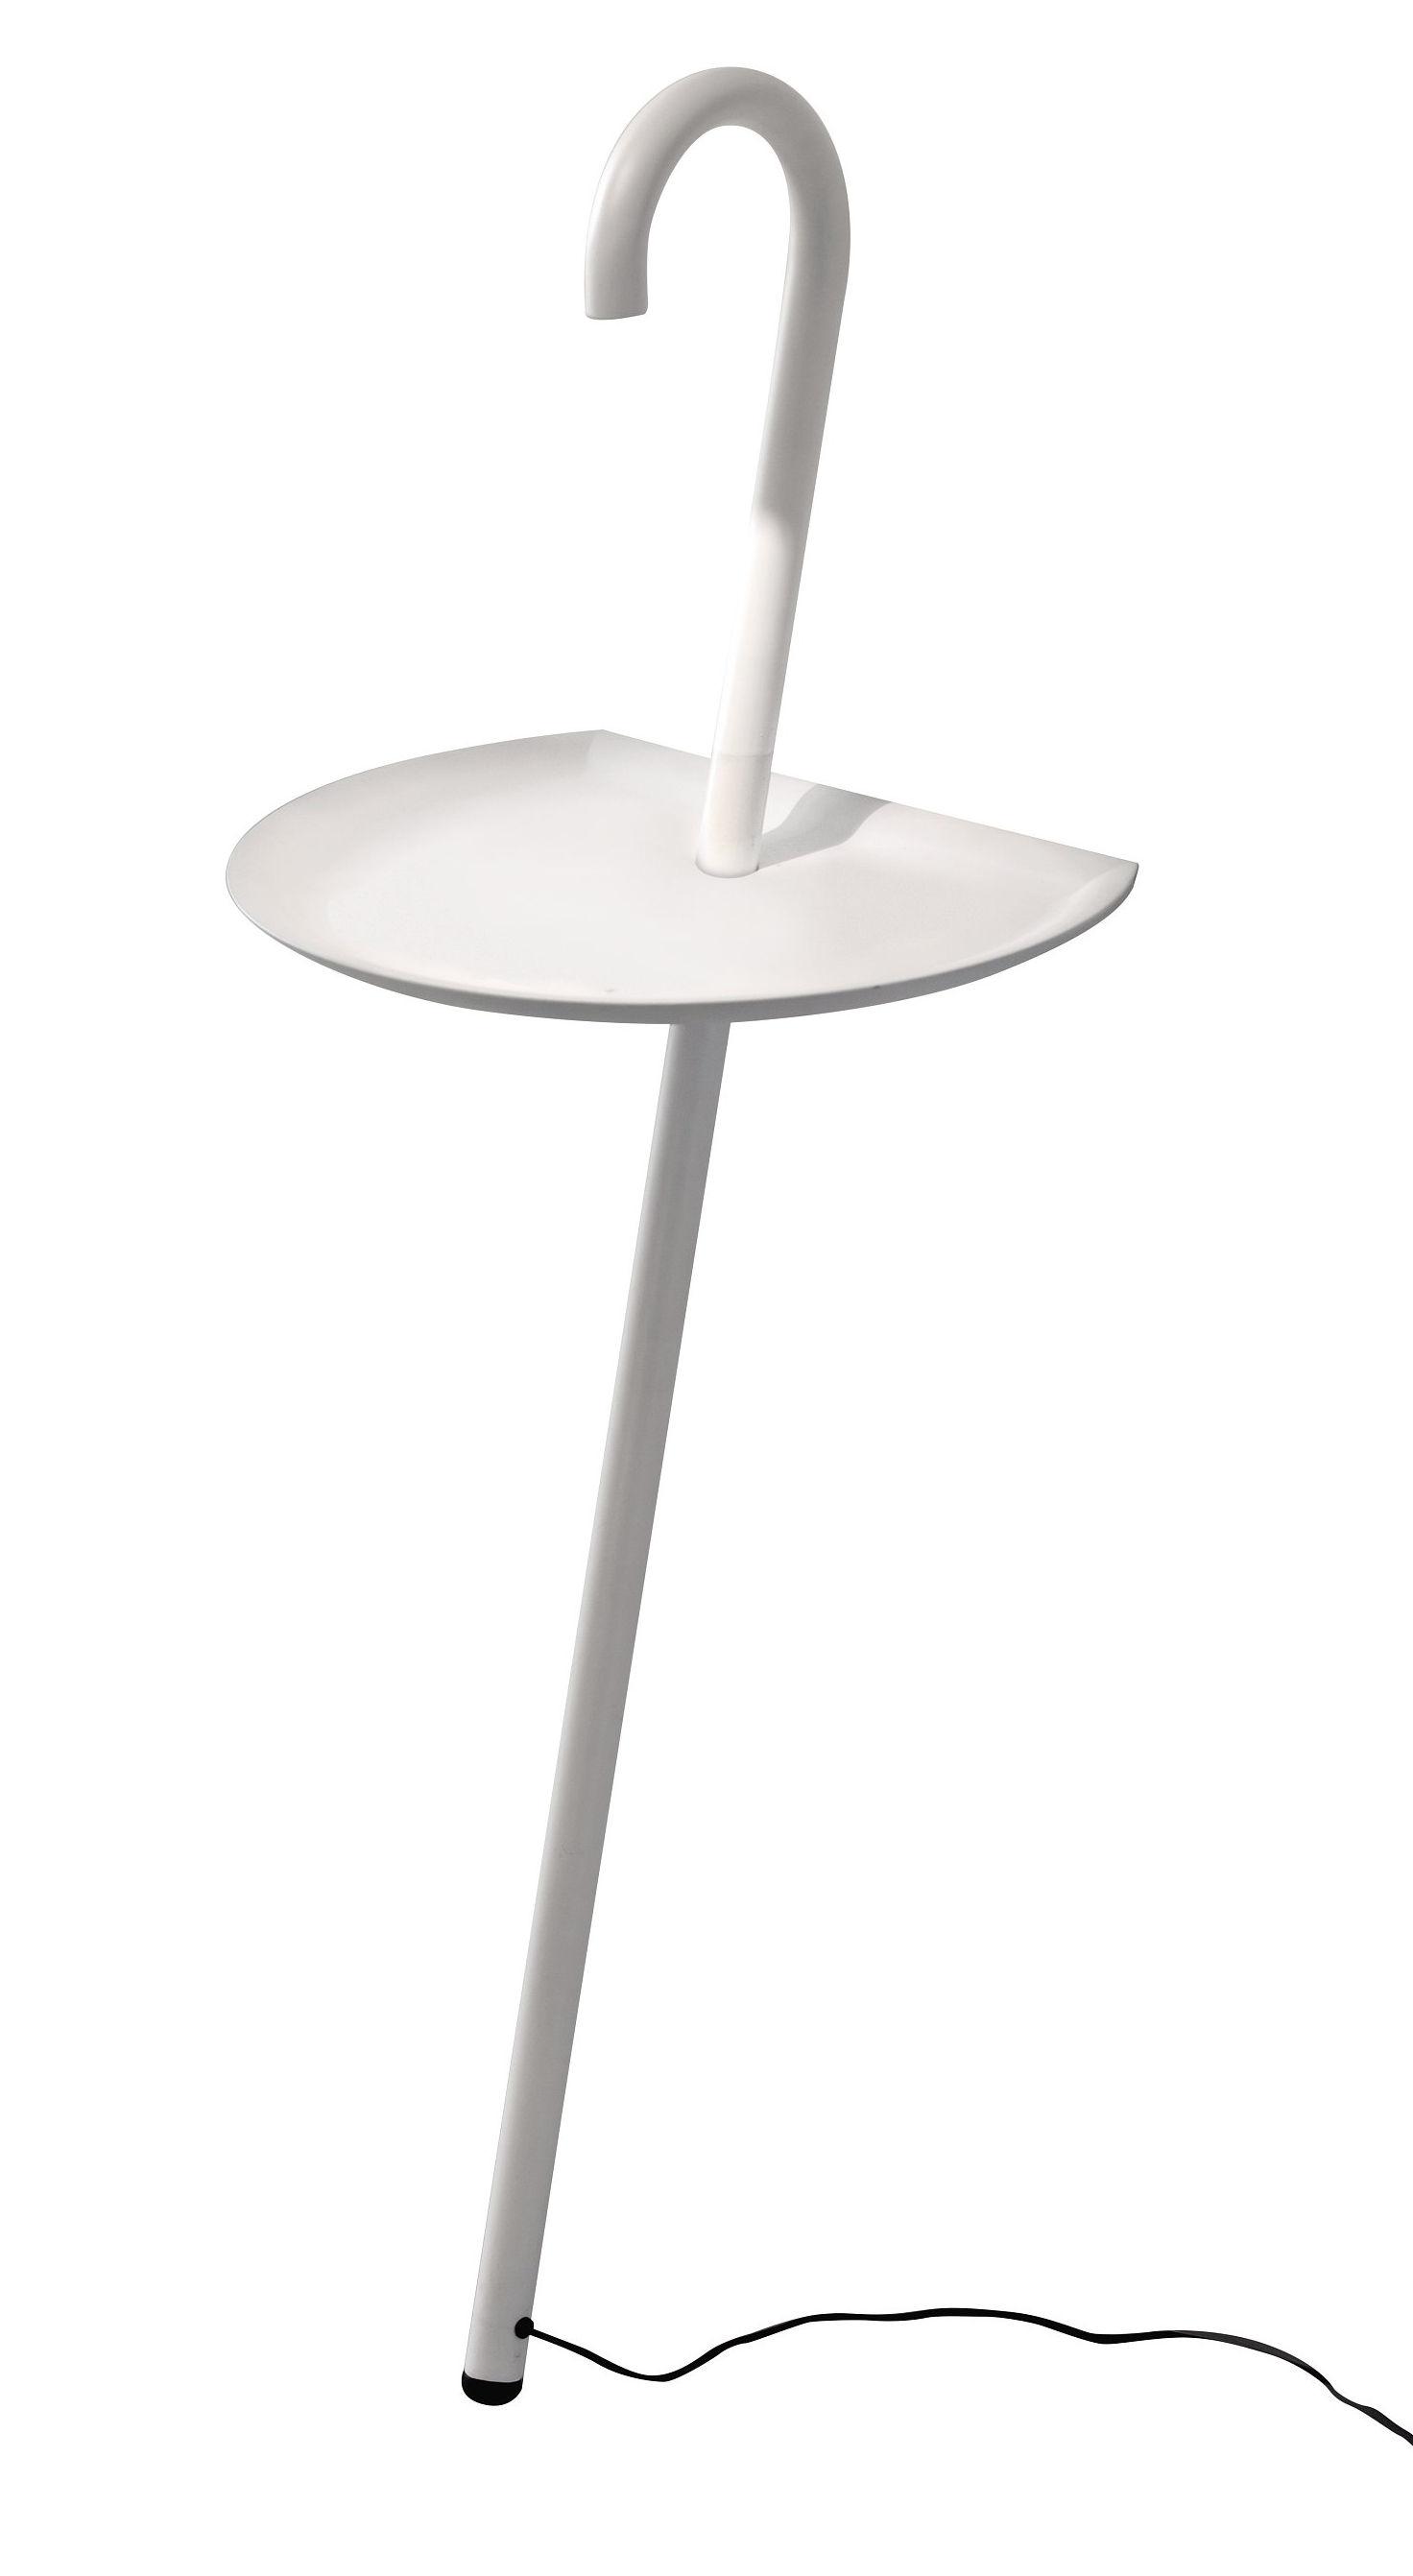 Mobilier - Tables basses - Lampe Clochard LED / Guéridon - Martinelli Luce - Blanc - Métal peint, Polyuréthane